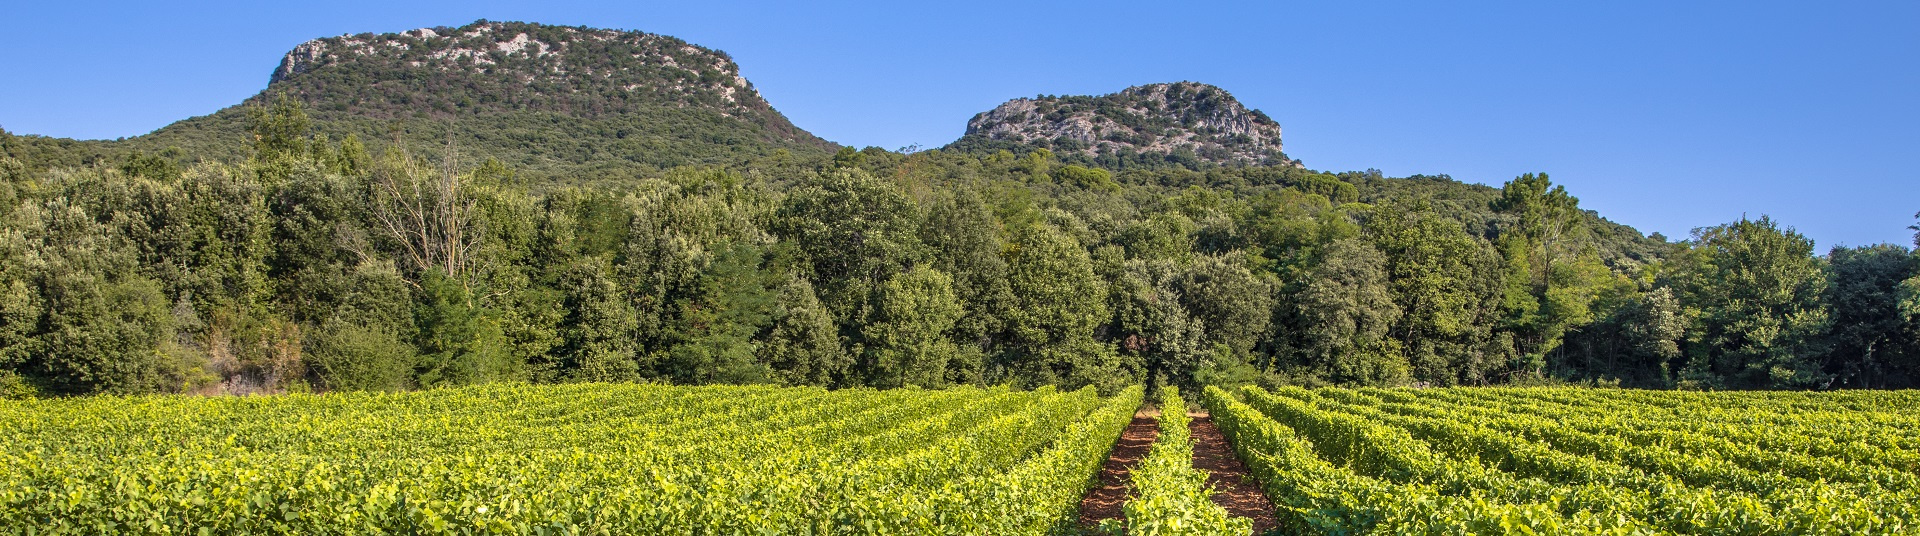 Week-end pas cher Languedoc-Roussillon